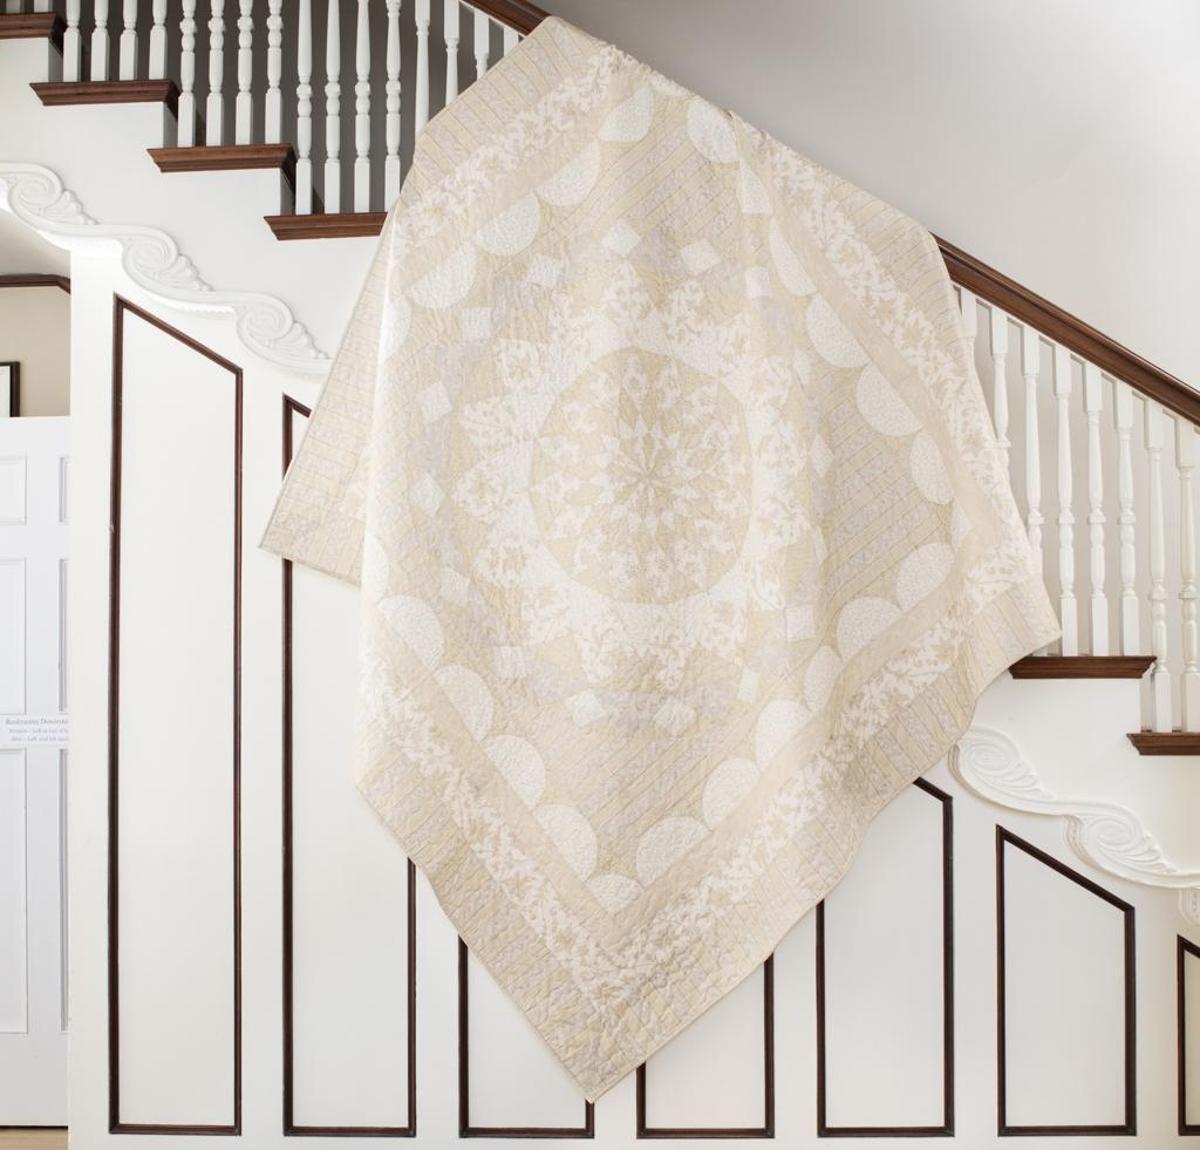 Aldridge Quilt Kit | Fabrics and Patterns : downton abbey quilt kits - Adamdwight.com